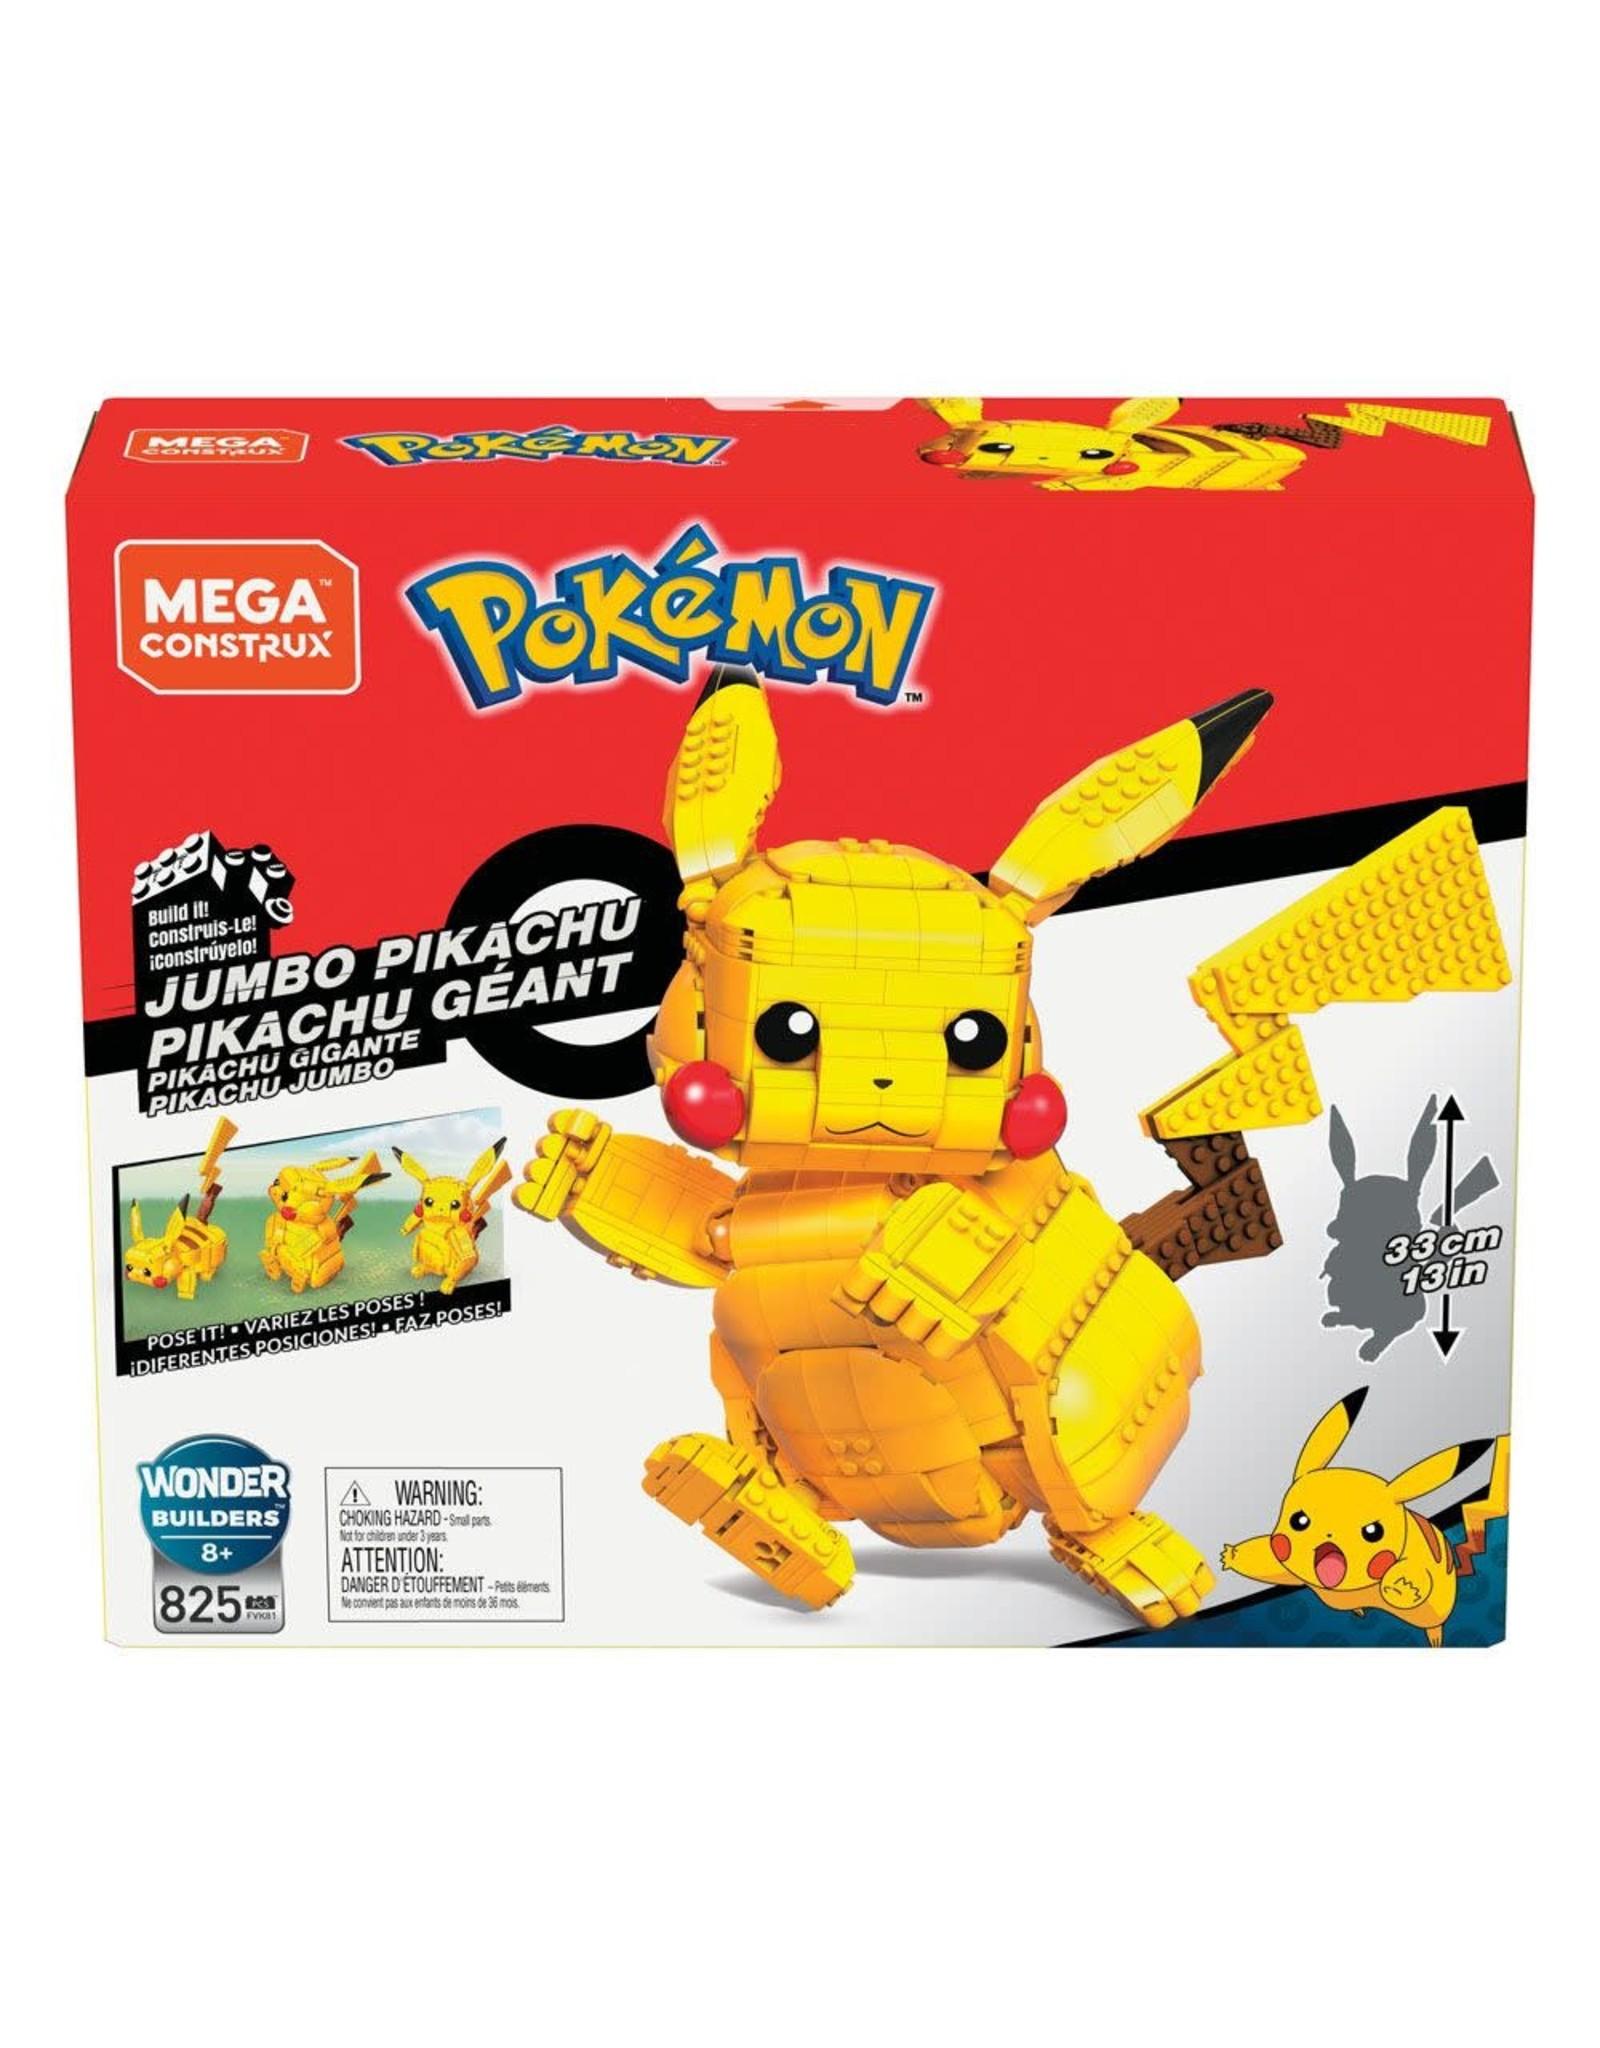 Pokémon - Jumbo Pikachu - Mega Construx Wonder Builders Construction Set - 33 cm